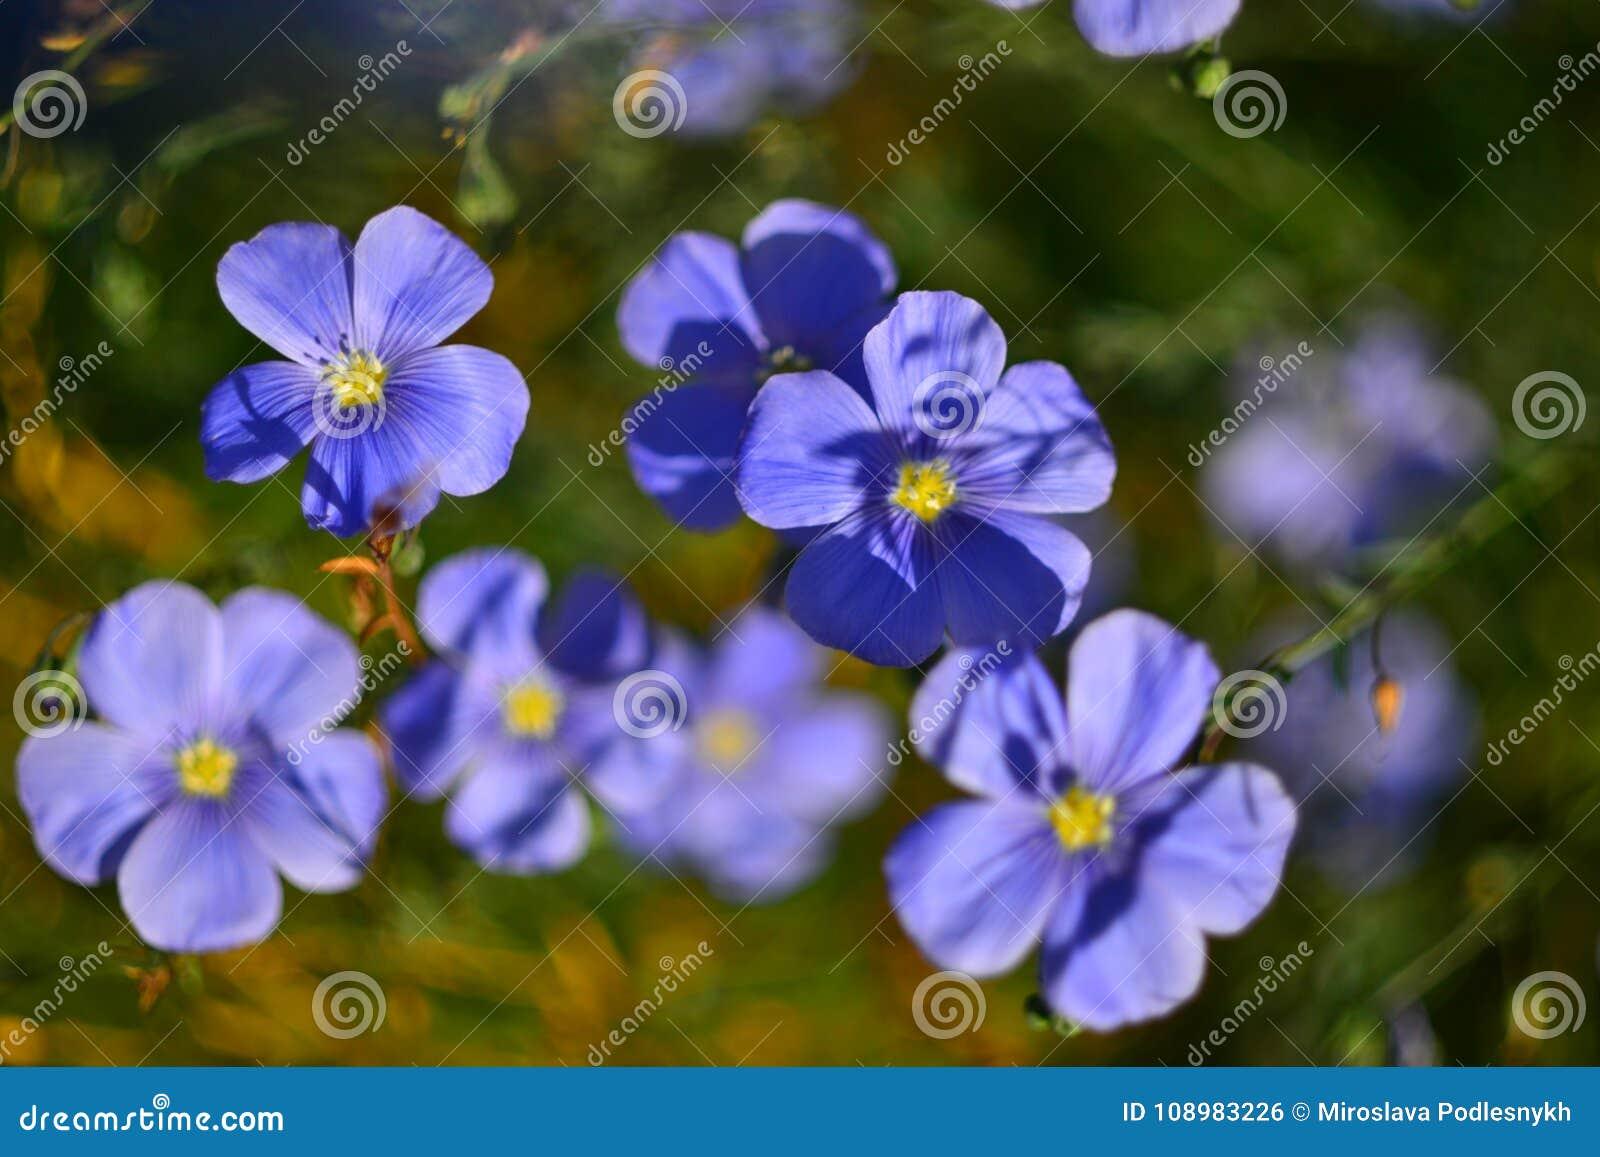 Blue Flowers On A Green Background Field Flowers Of A Cornflower